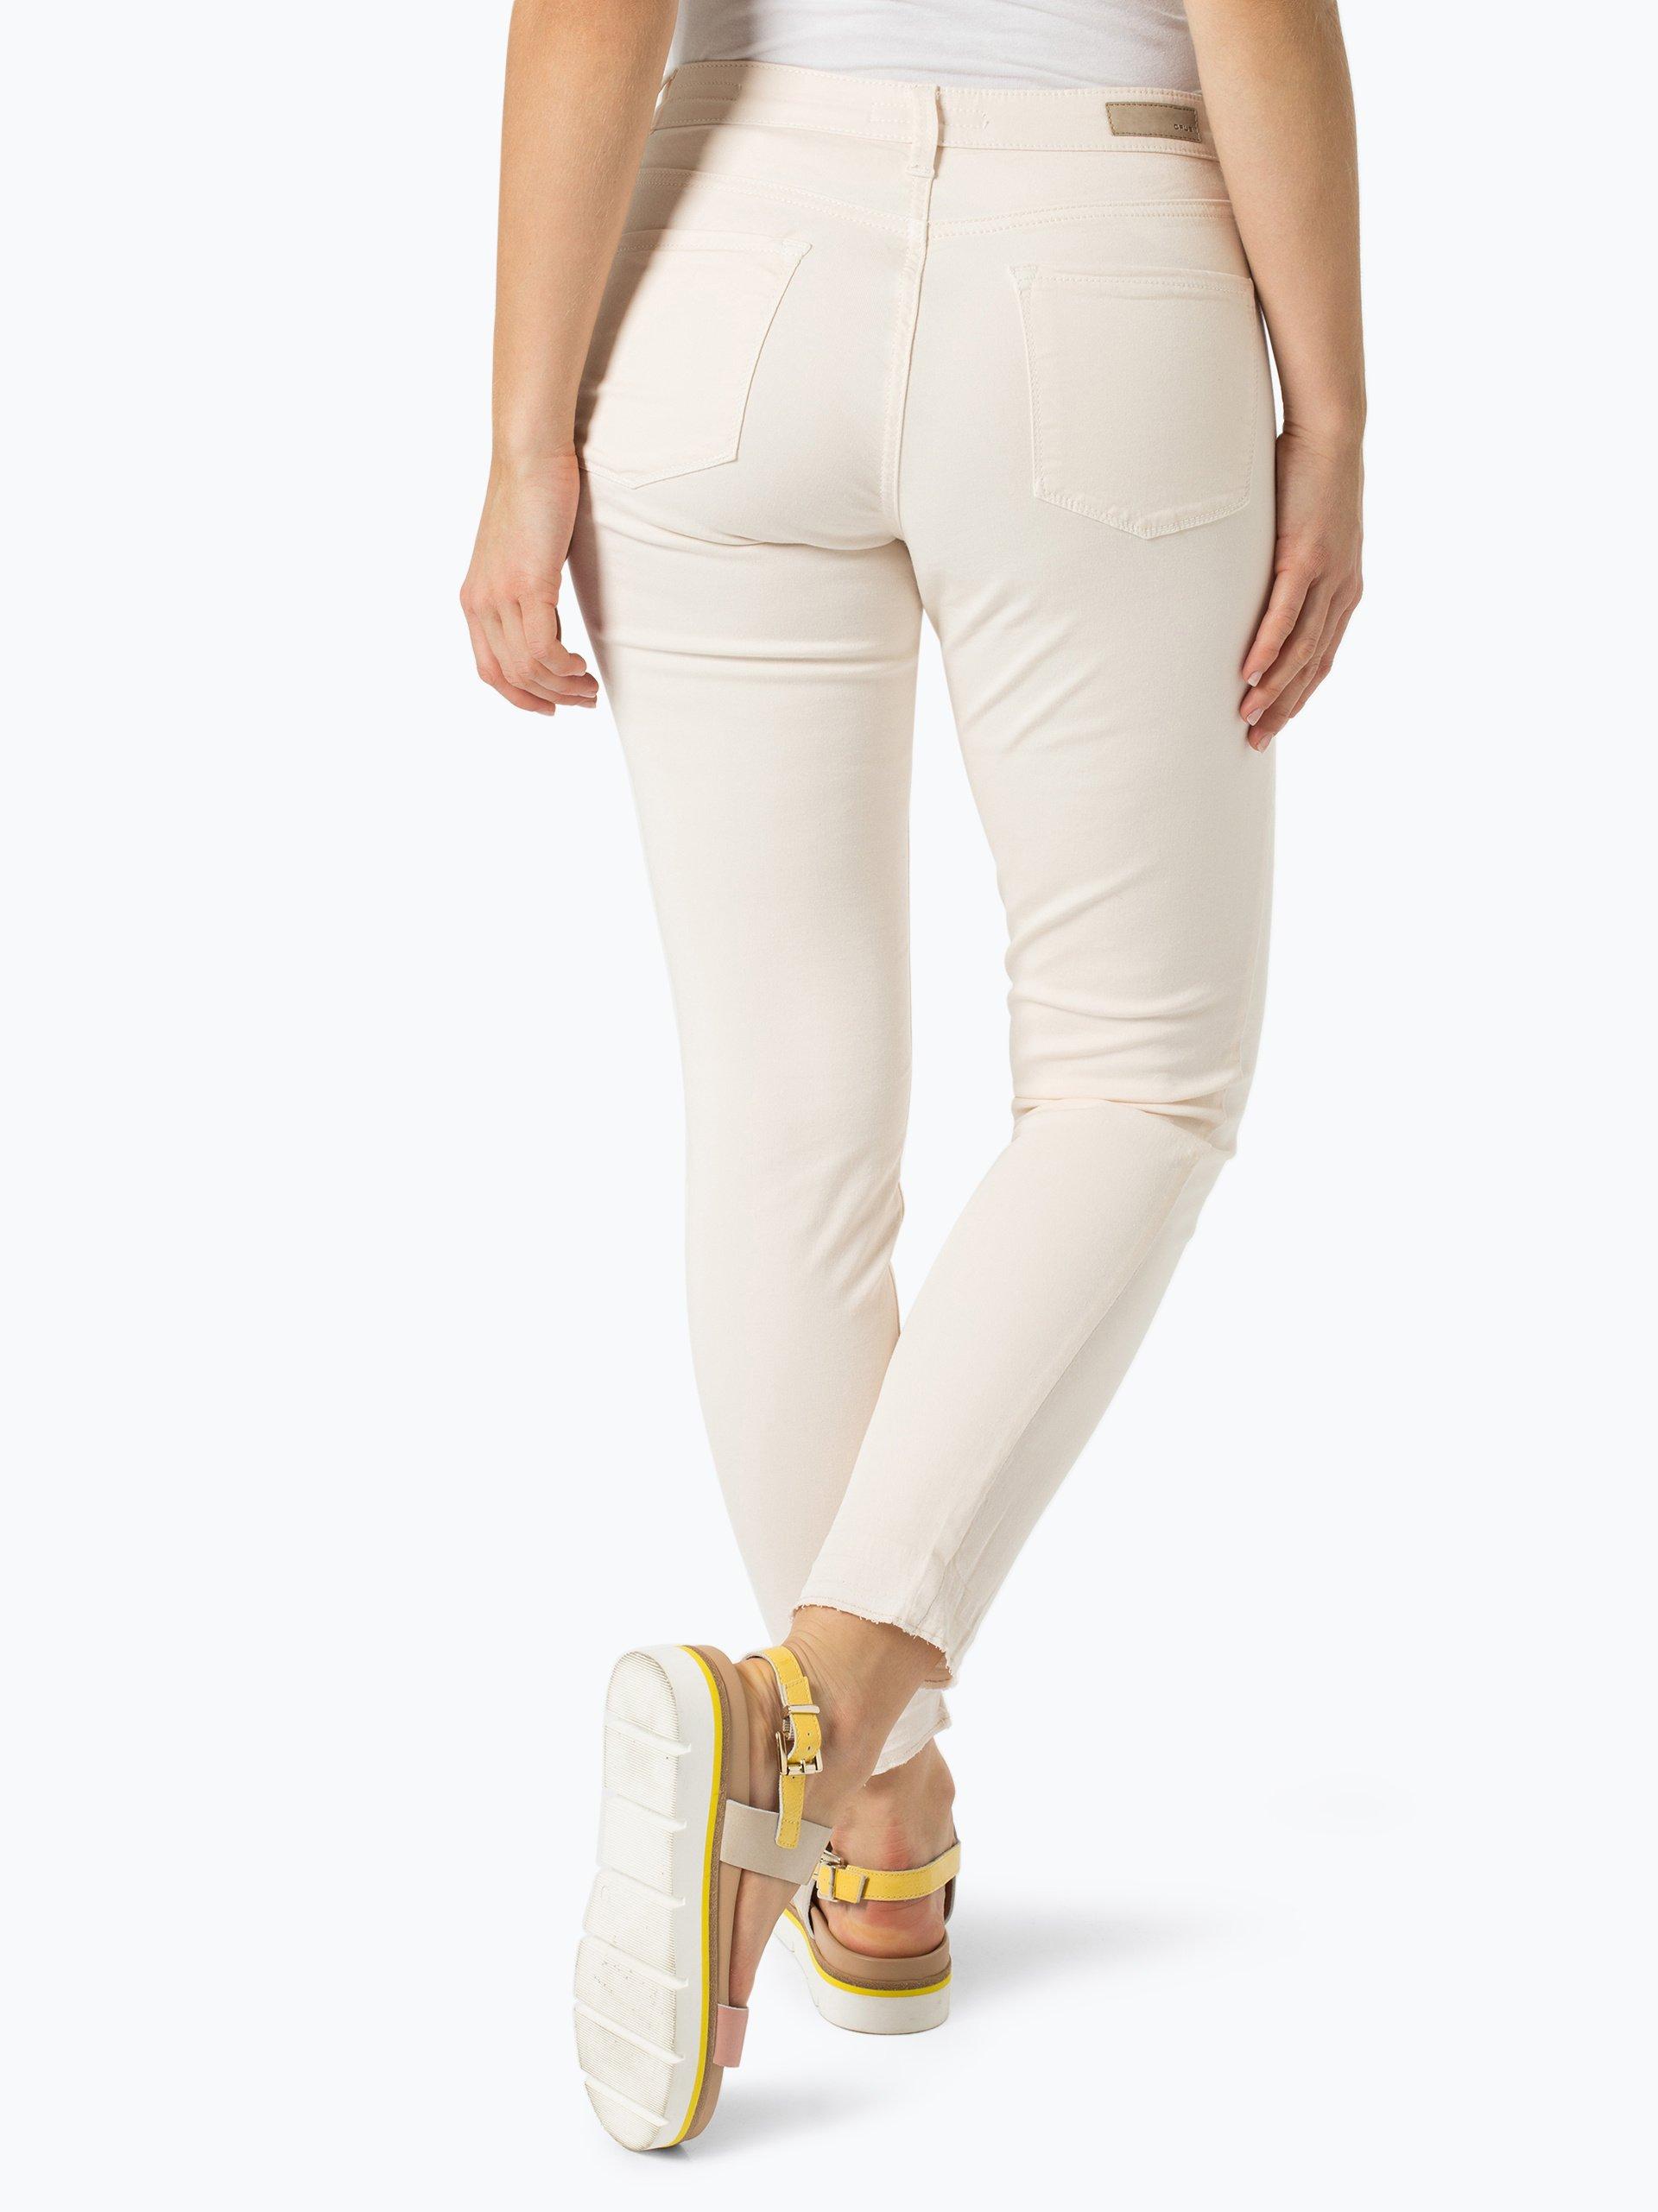 Opus Damen Jeans - Elma